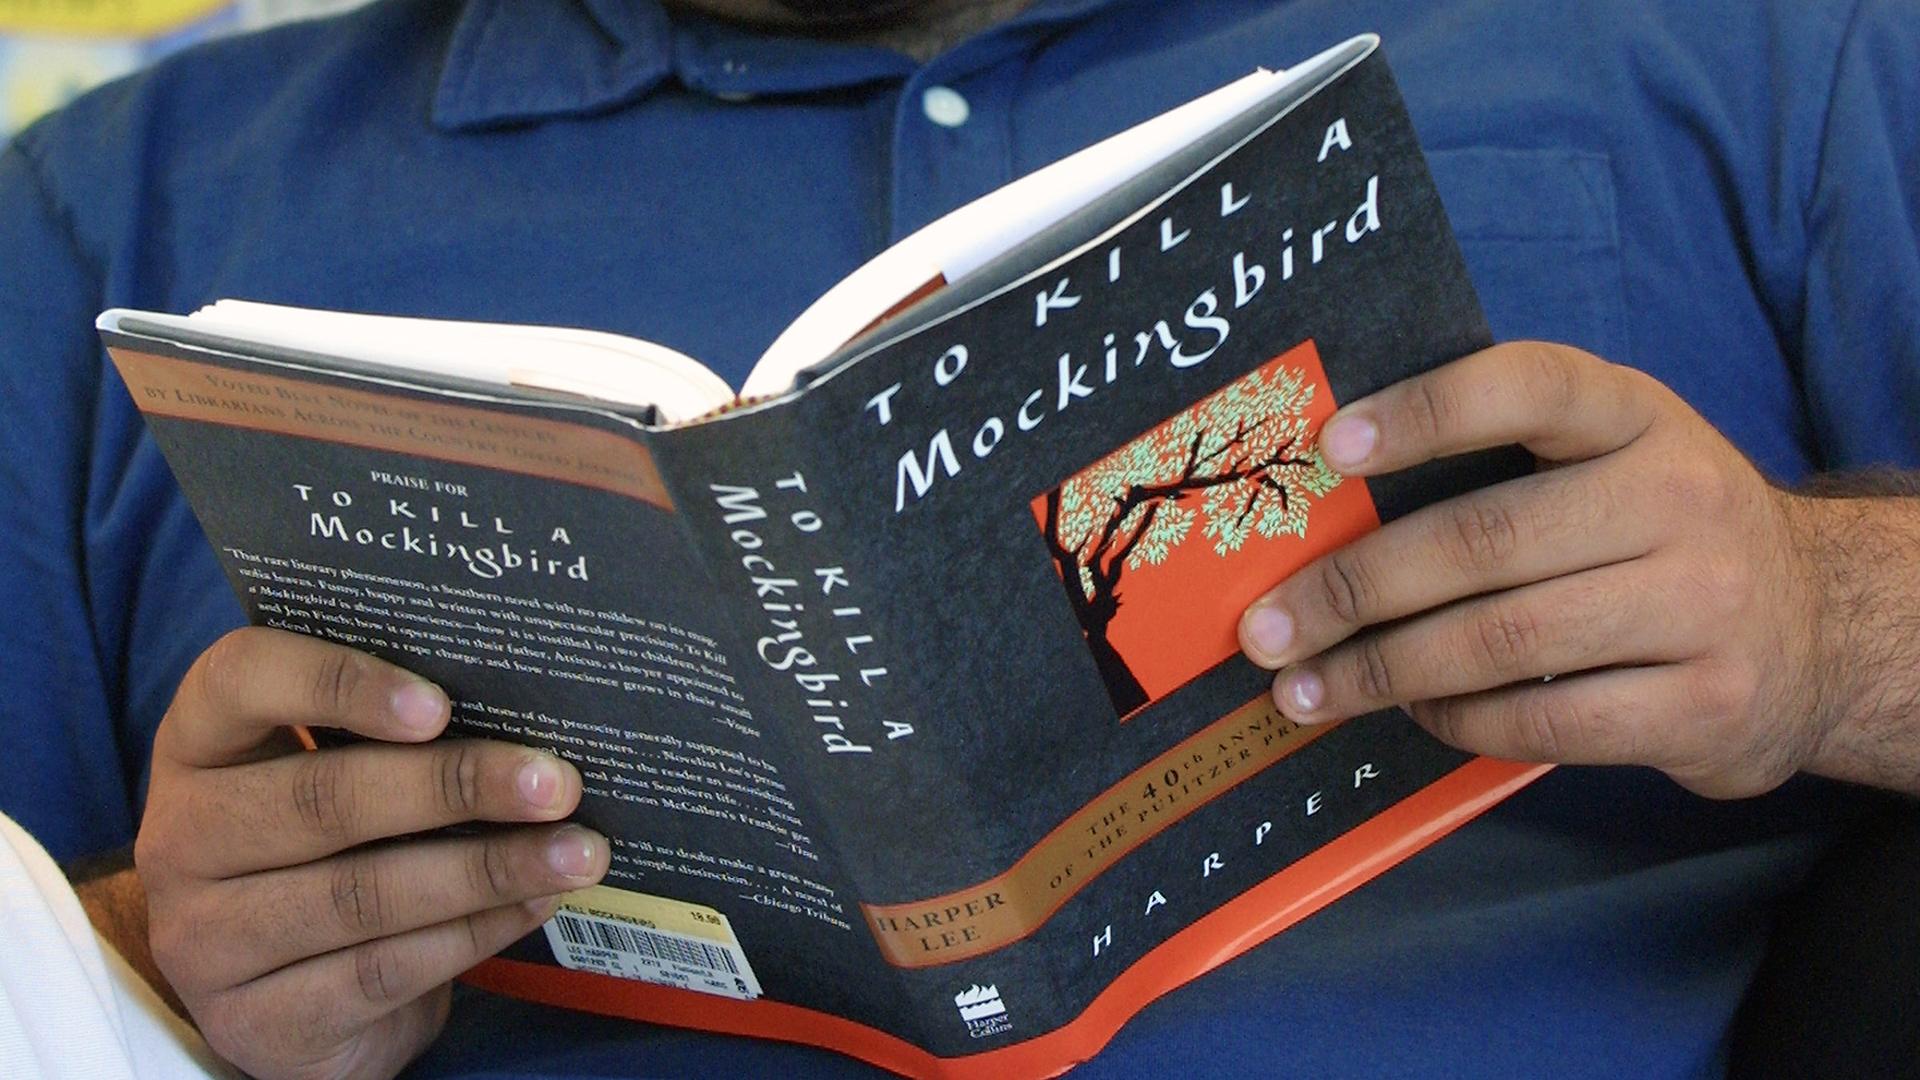 To Kill a Mockingbird book-159532.jpg25639744